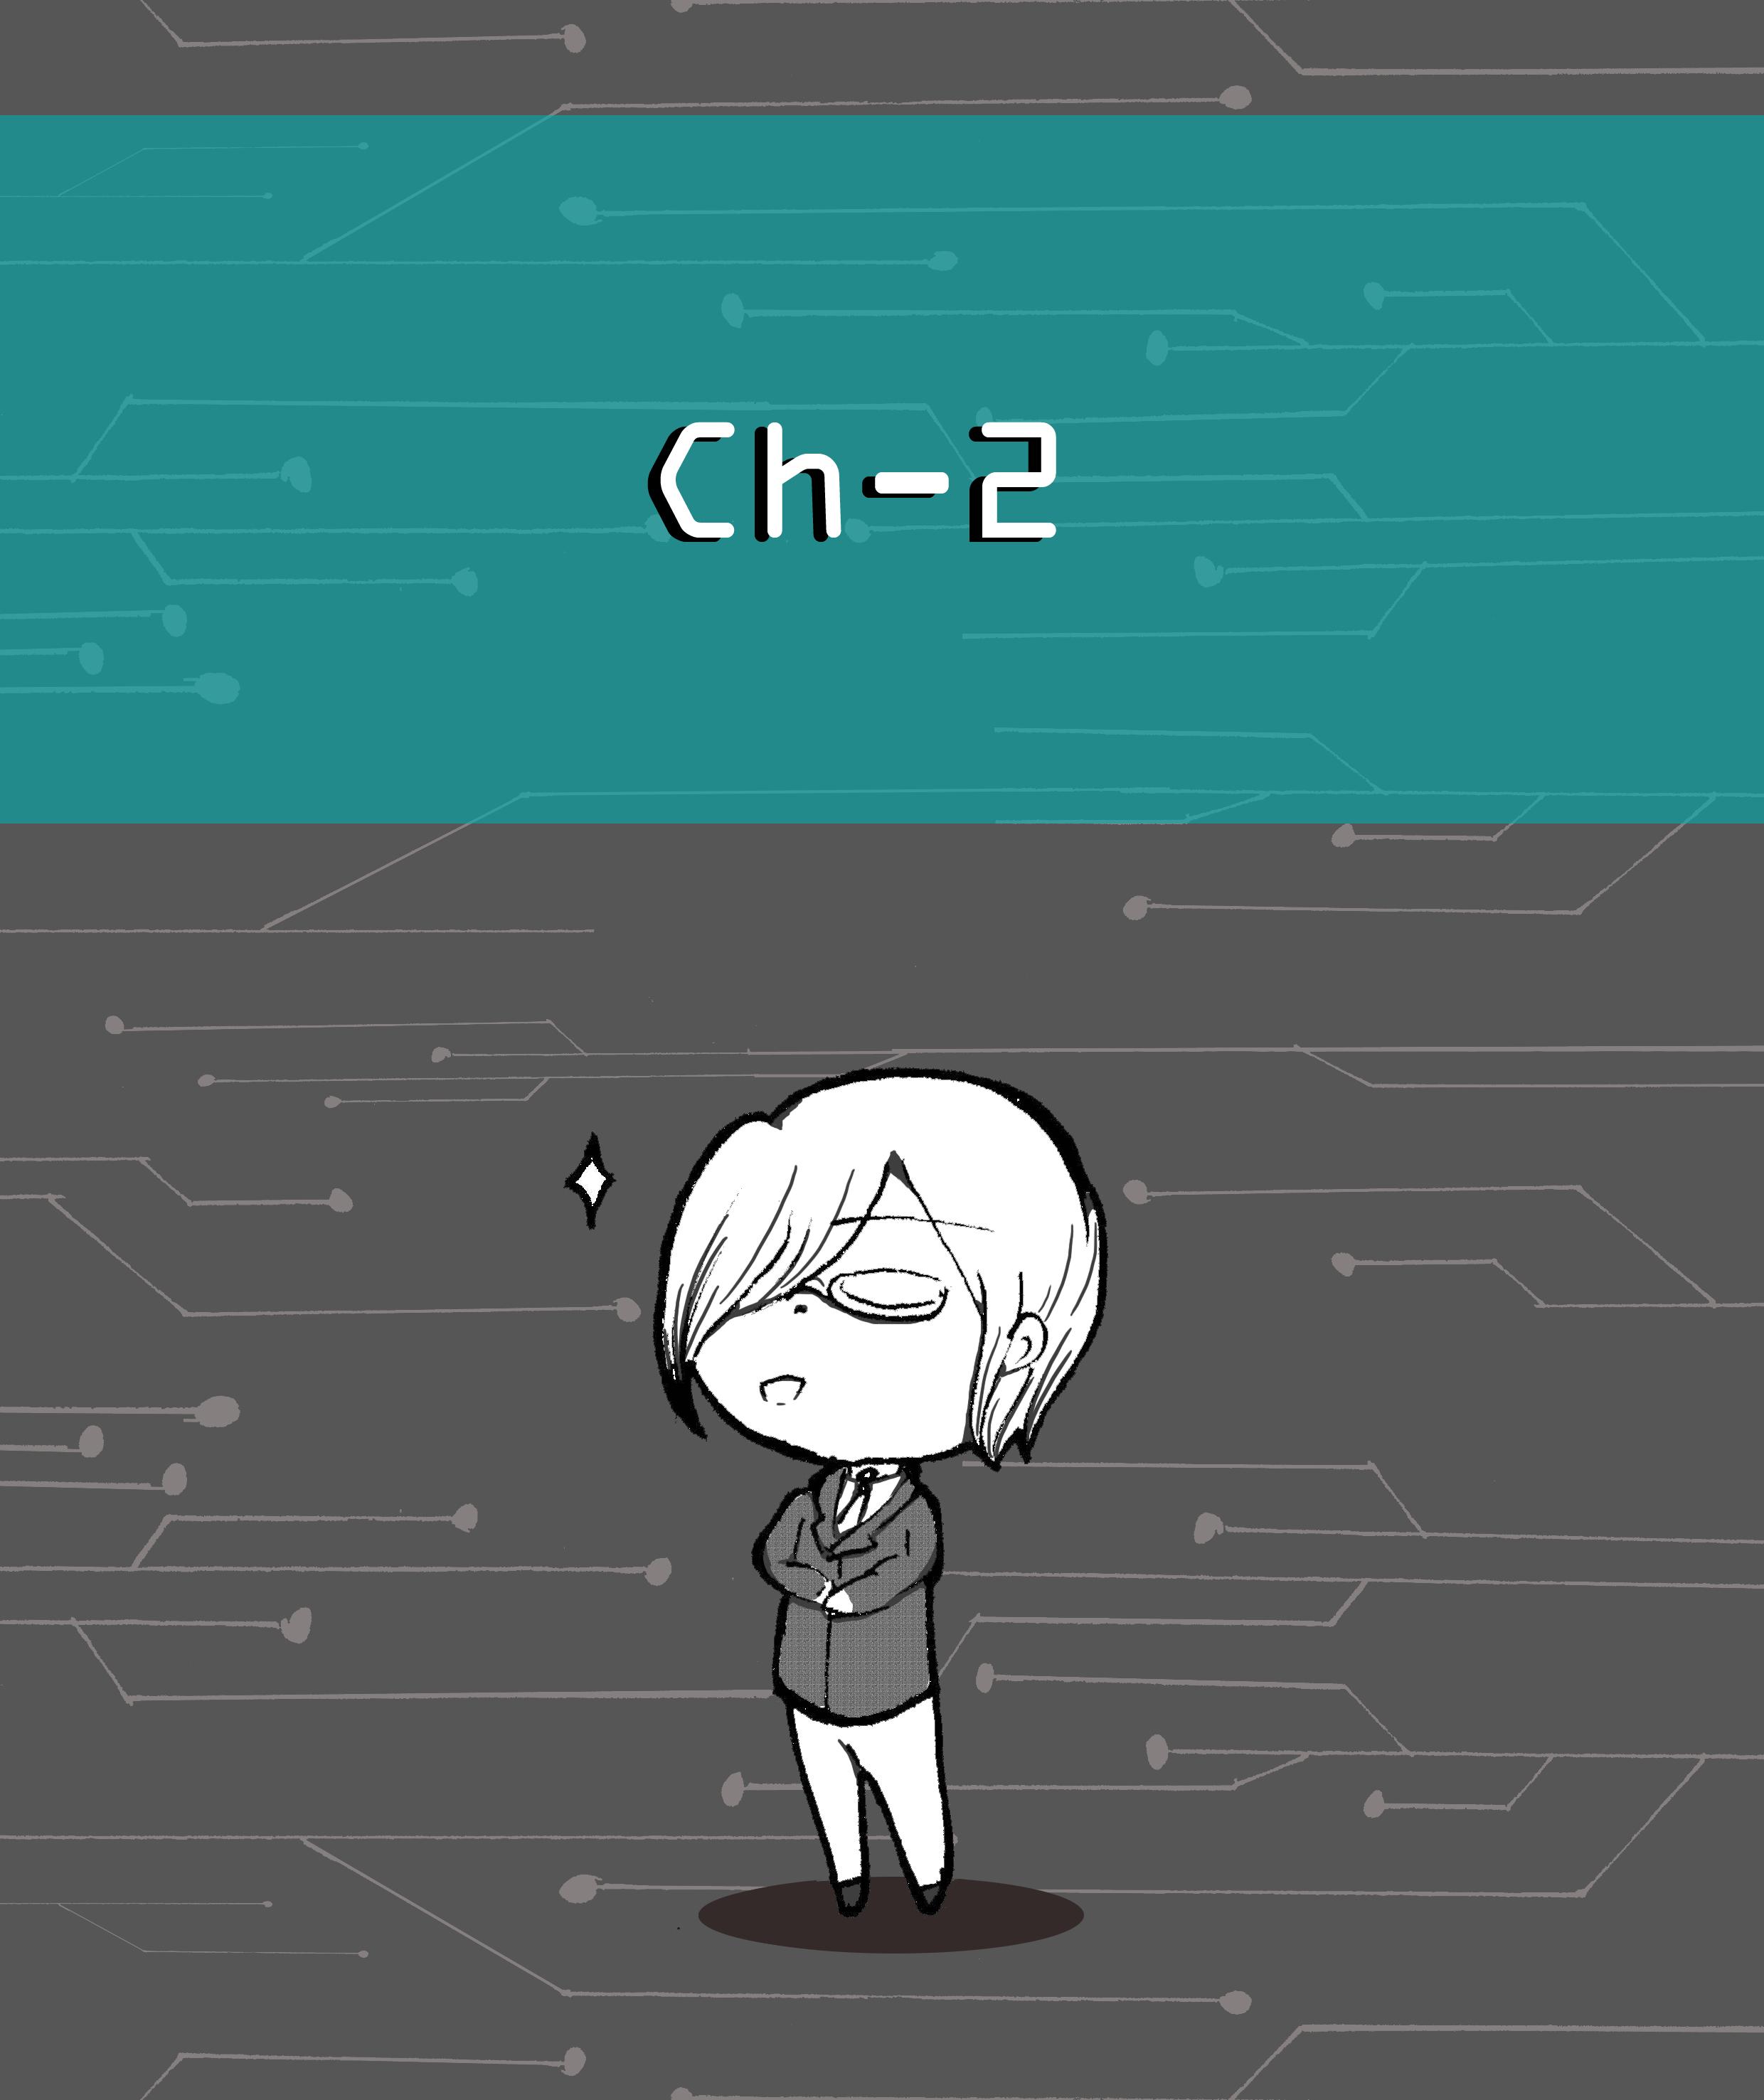 Ch - 2